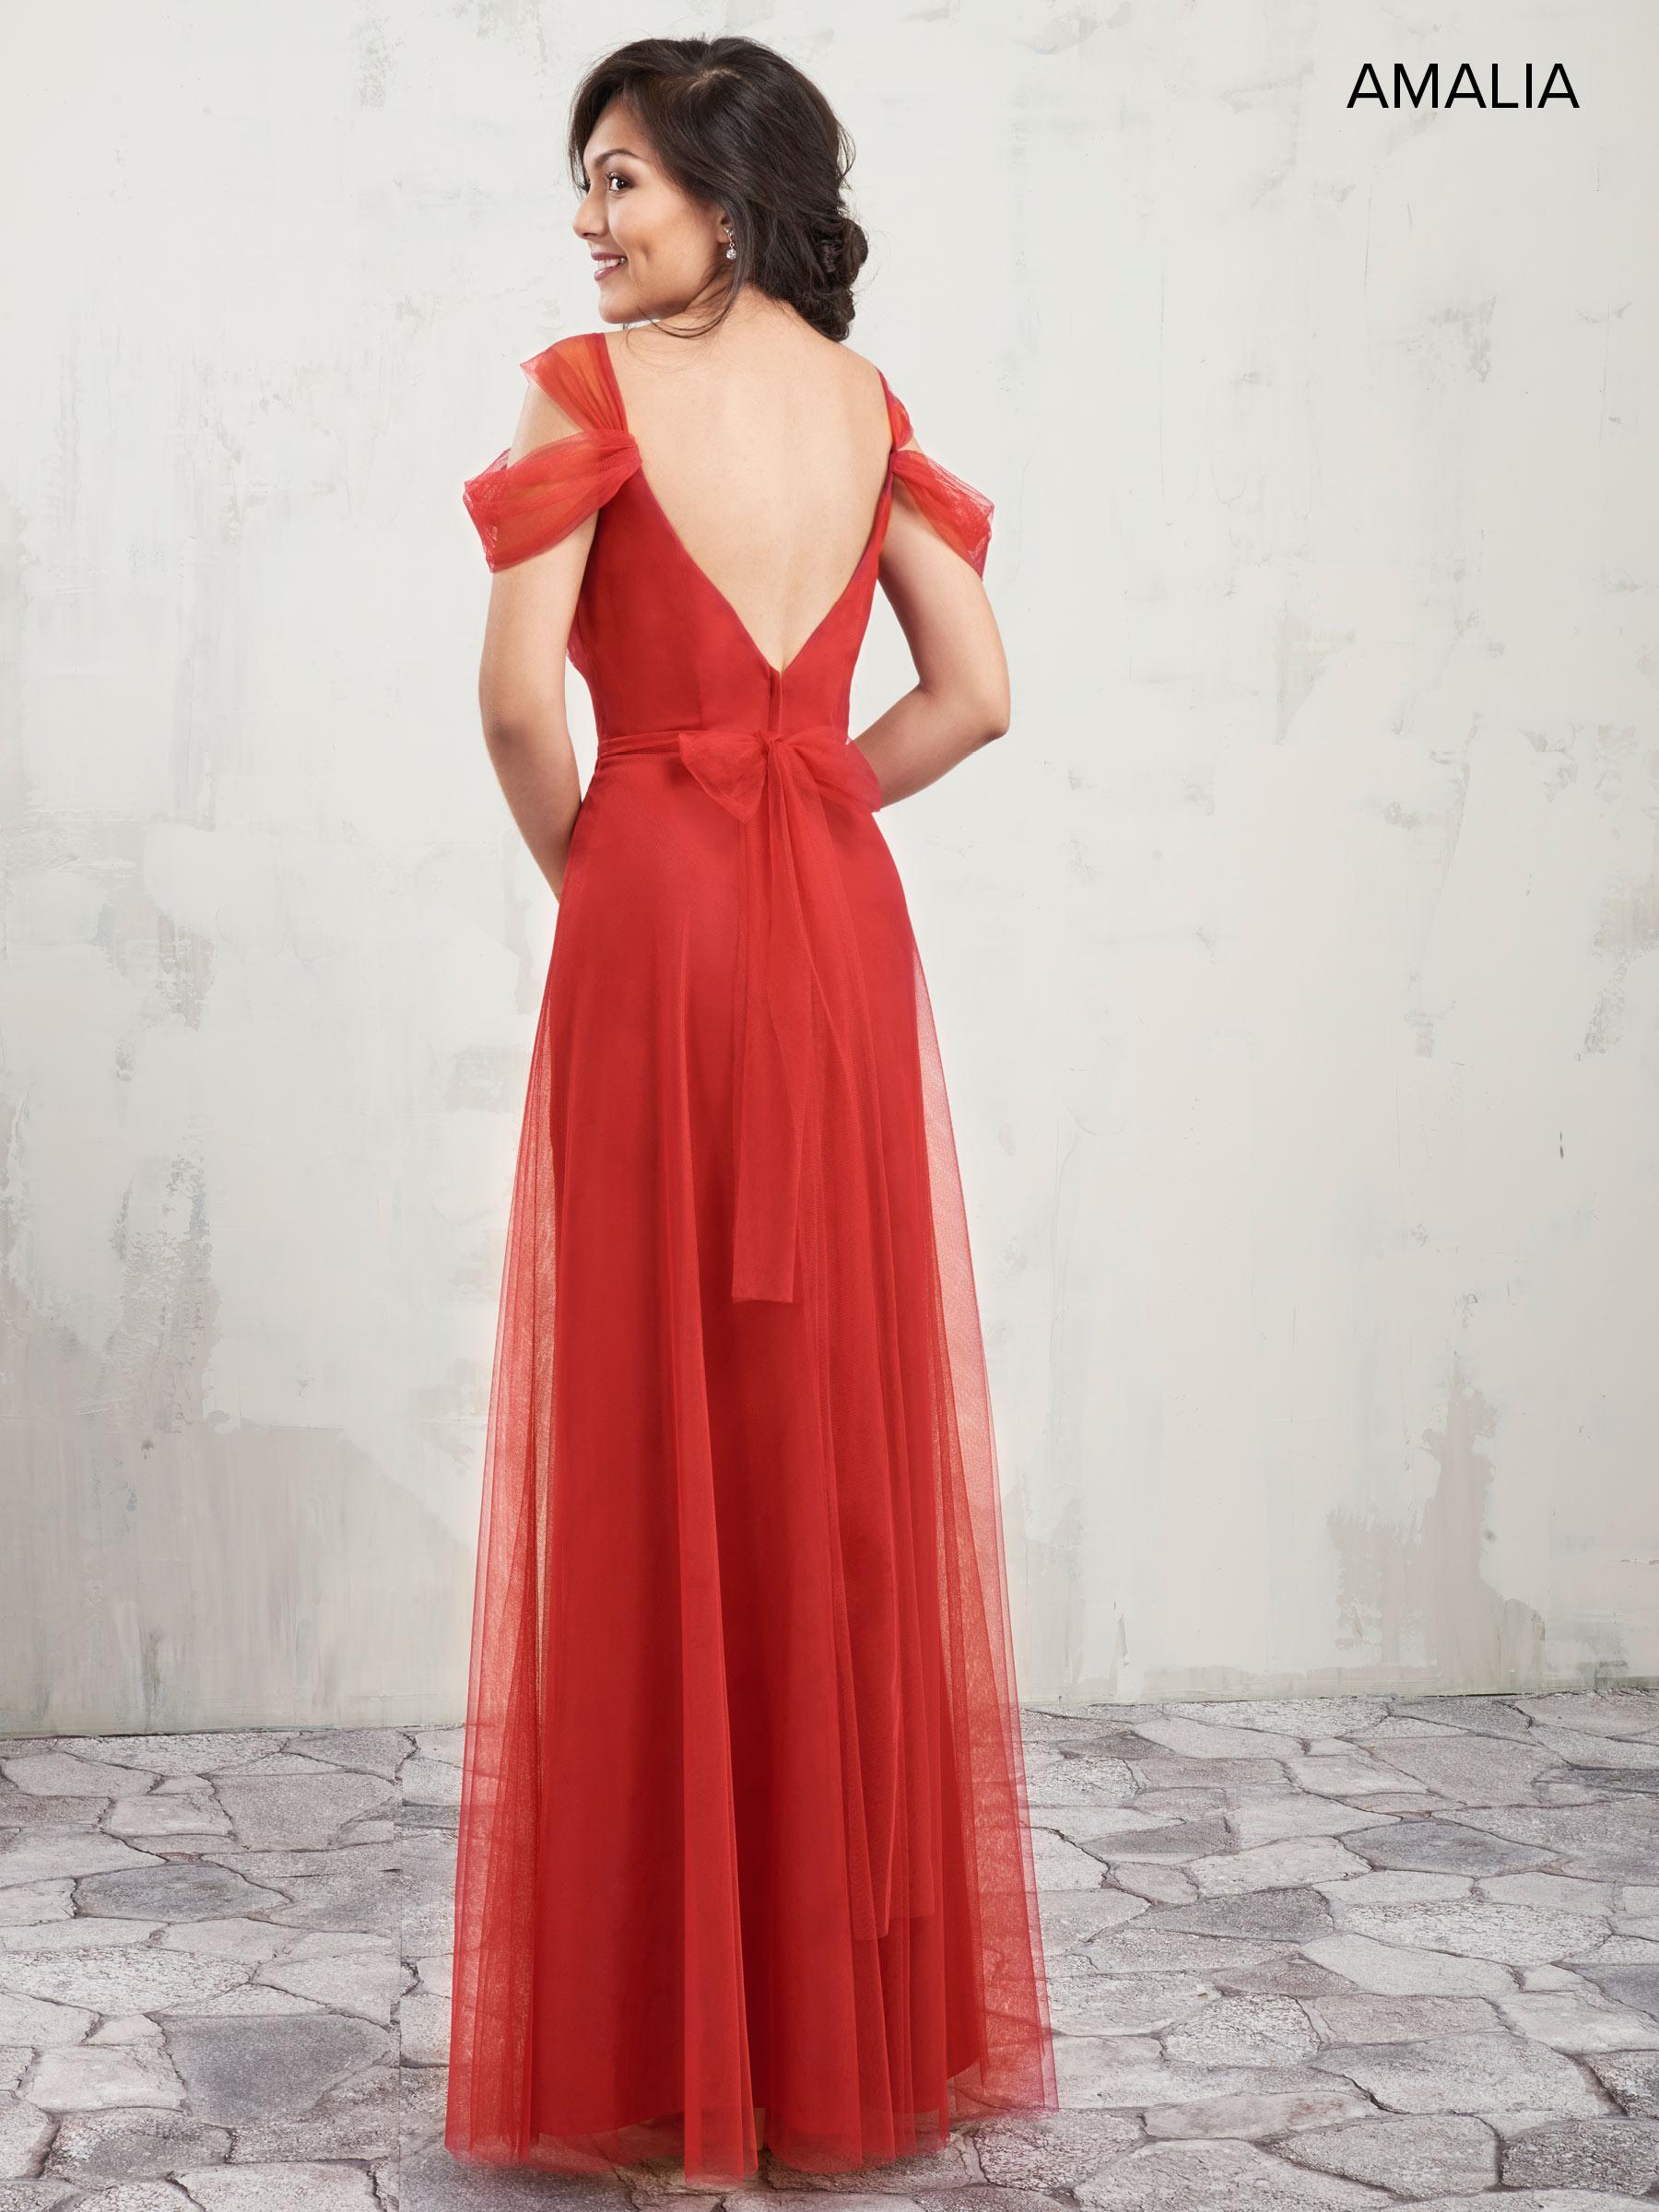 Amalia Bridesmaid Dresses | Amalia | Style - MB7008